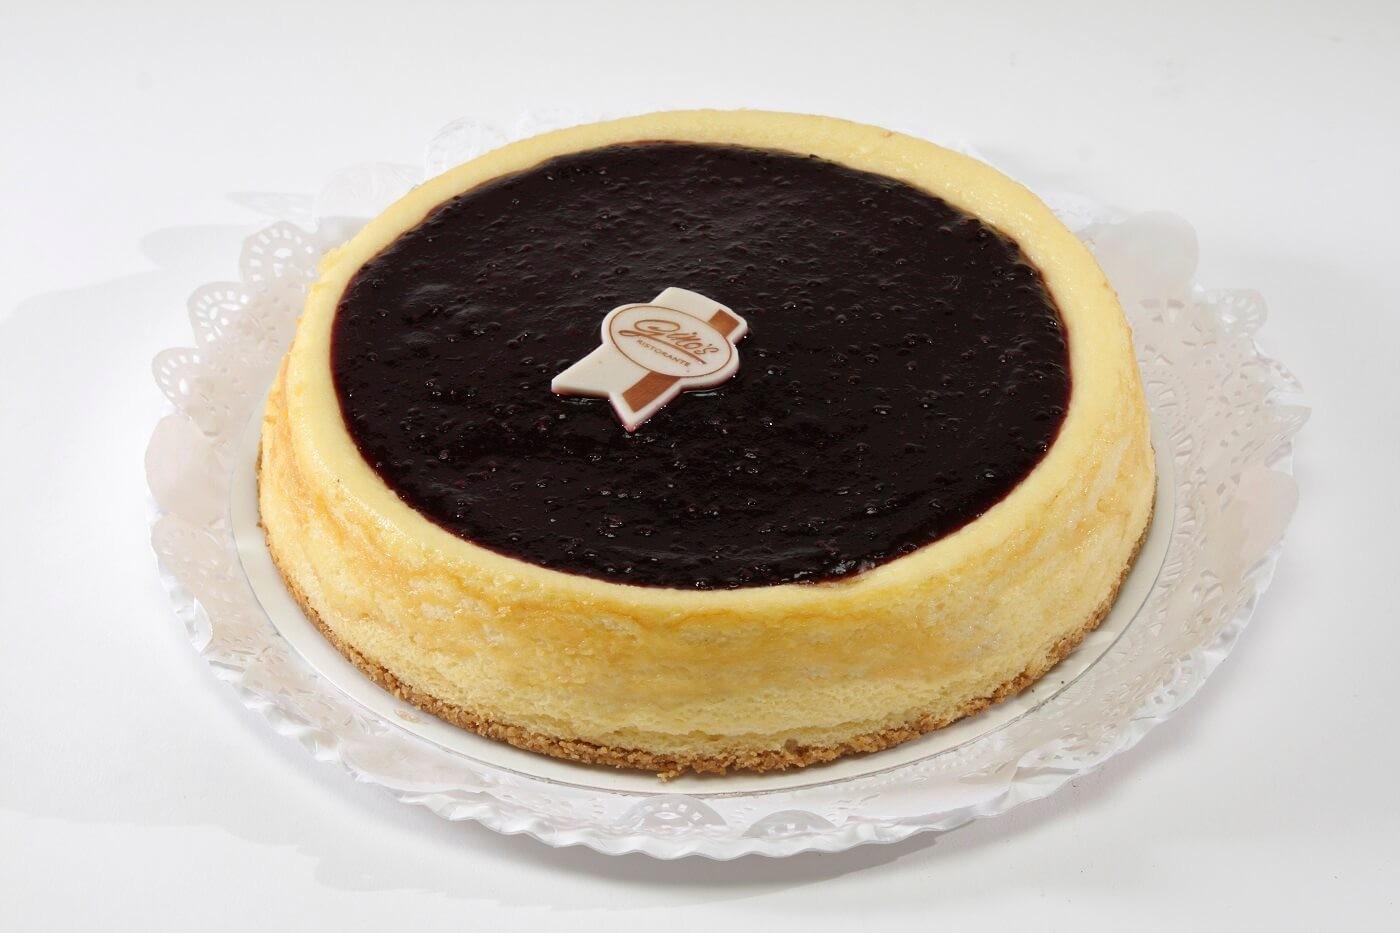 queso-zarzamora-ginos-brownie-pasteles-fiestas-bautizos-baby-shower-dulces